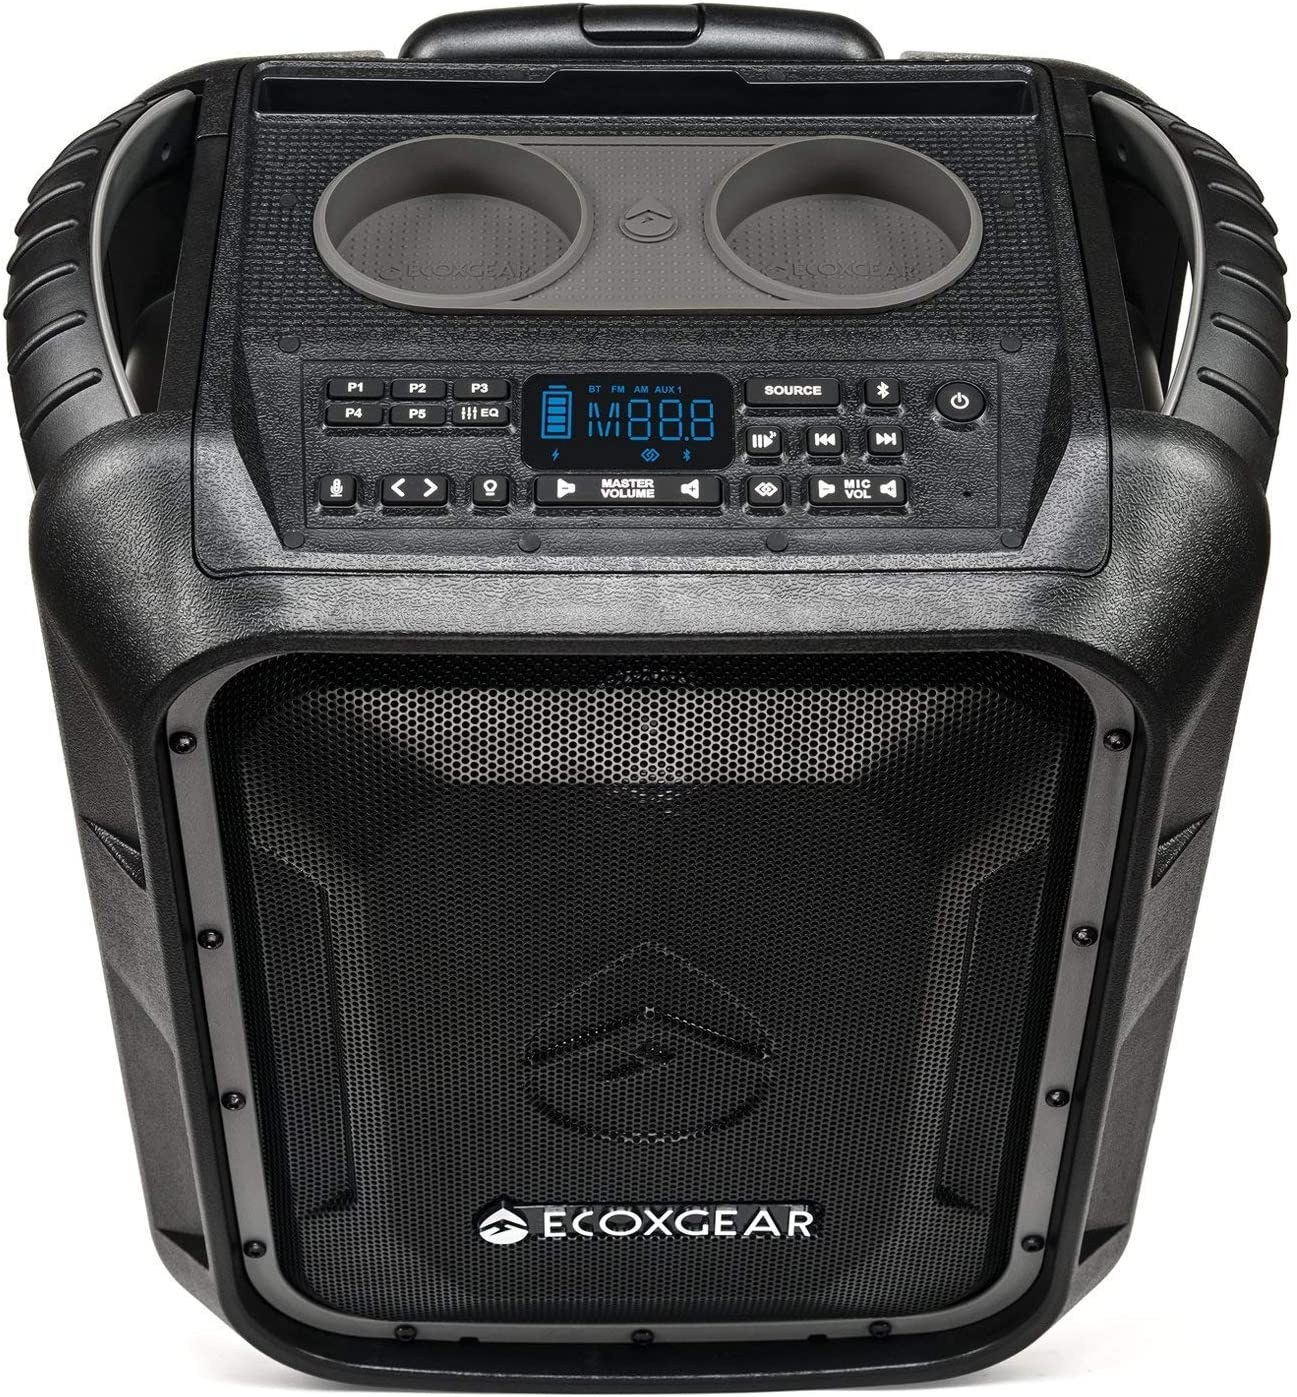 ecoxgear-ecoboulder-portable-speaker